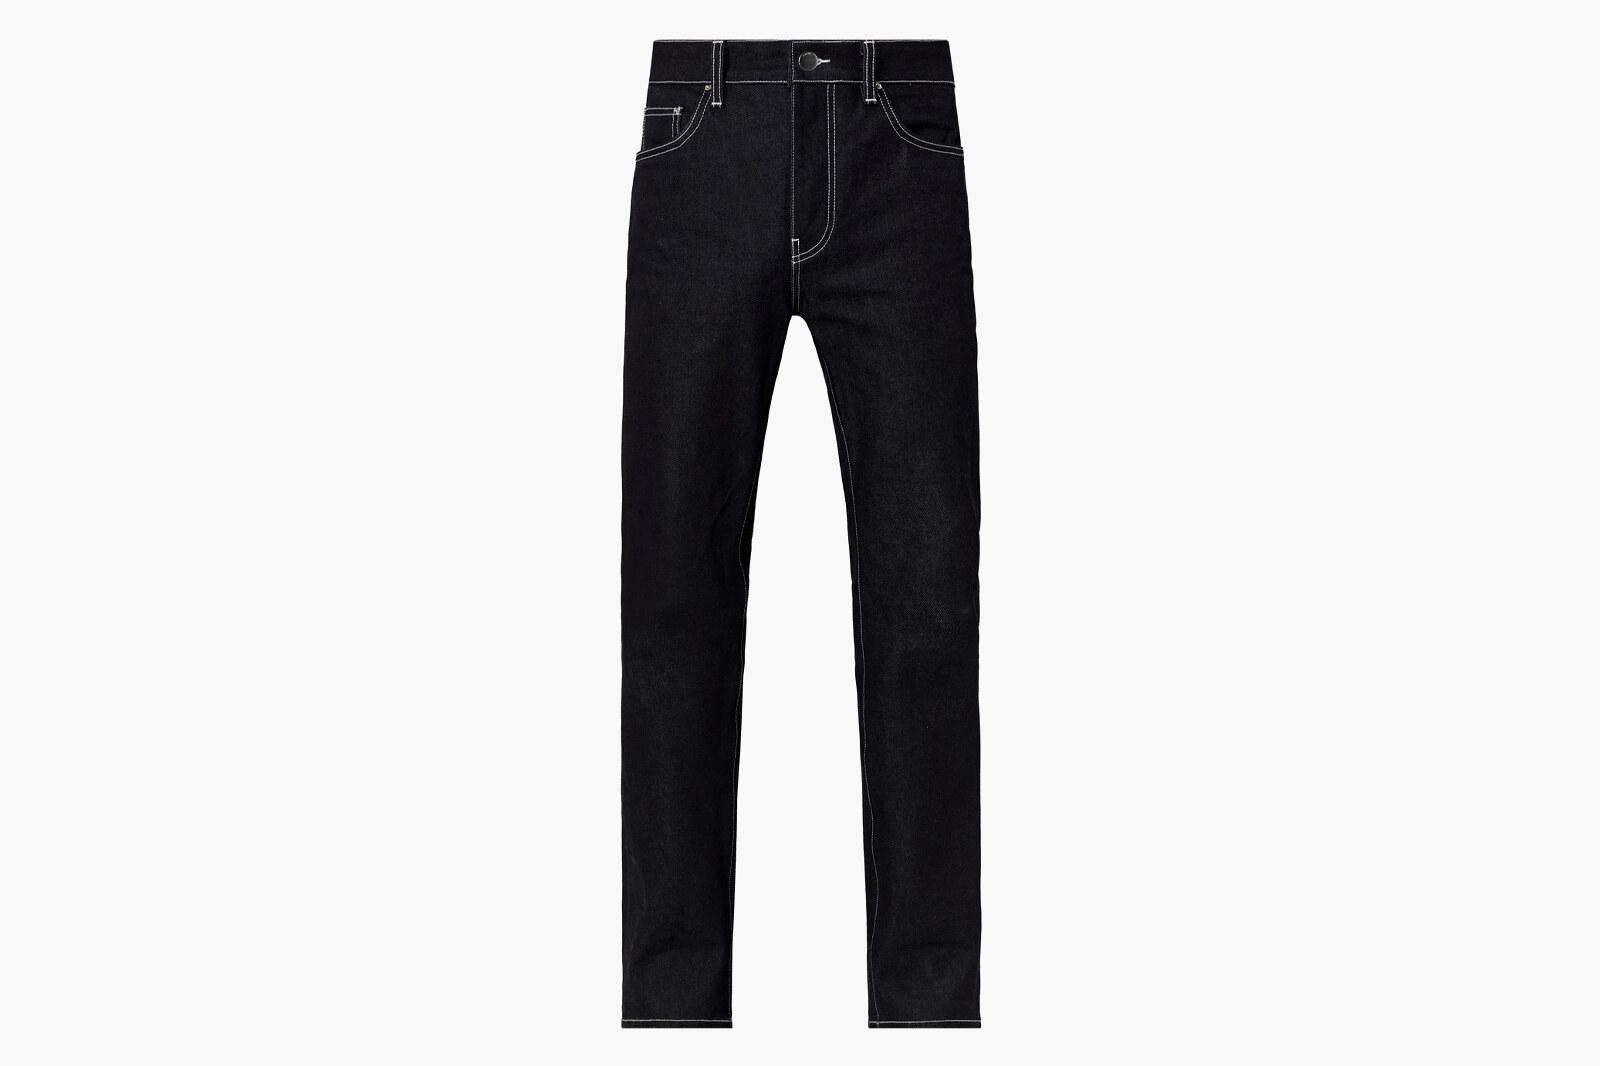 Amiri 5 pocket flare leg jeans